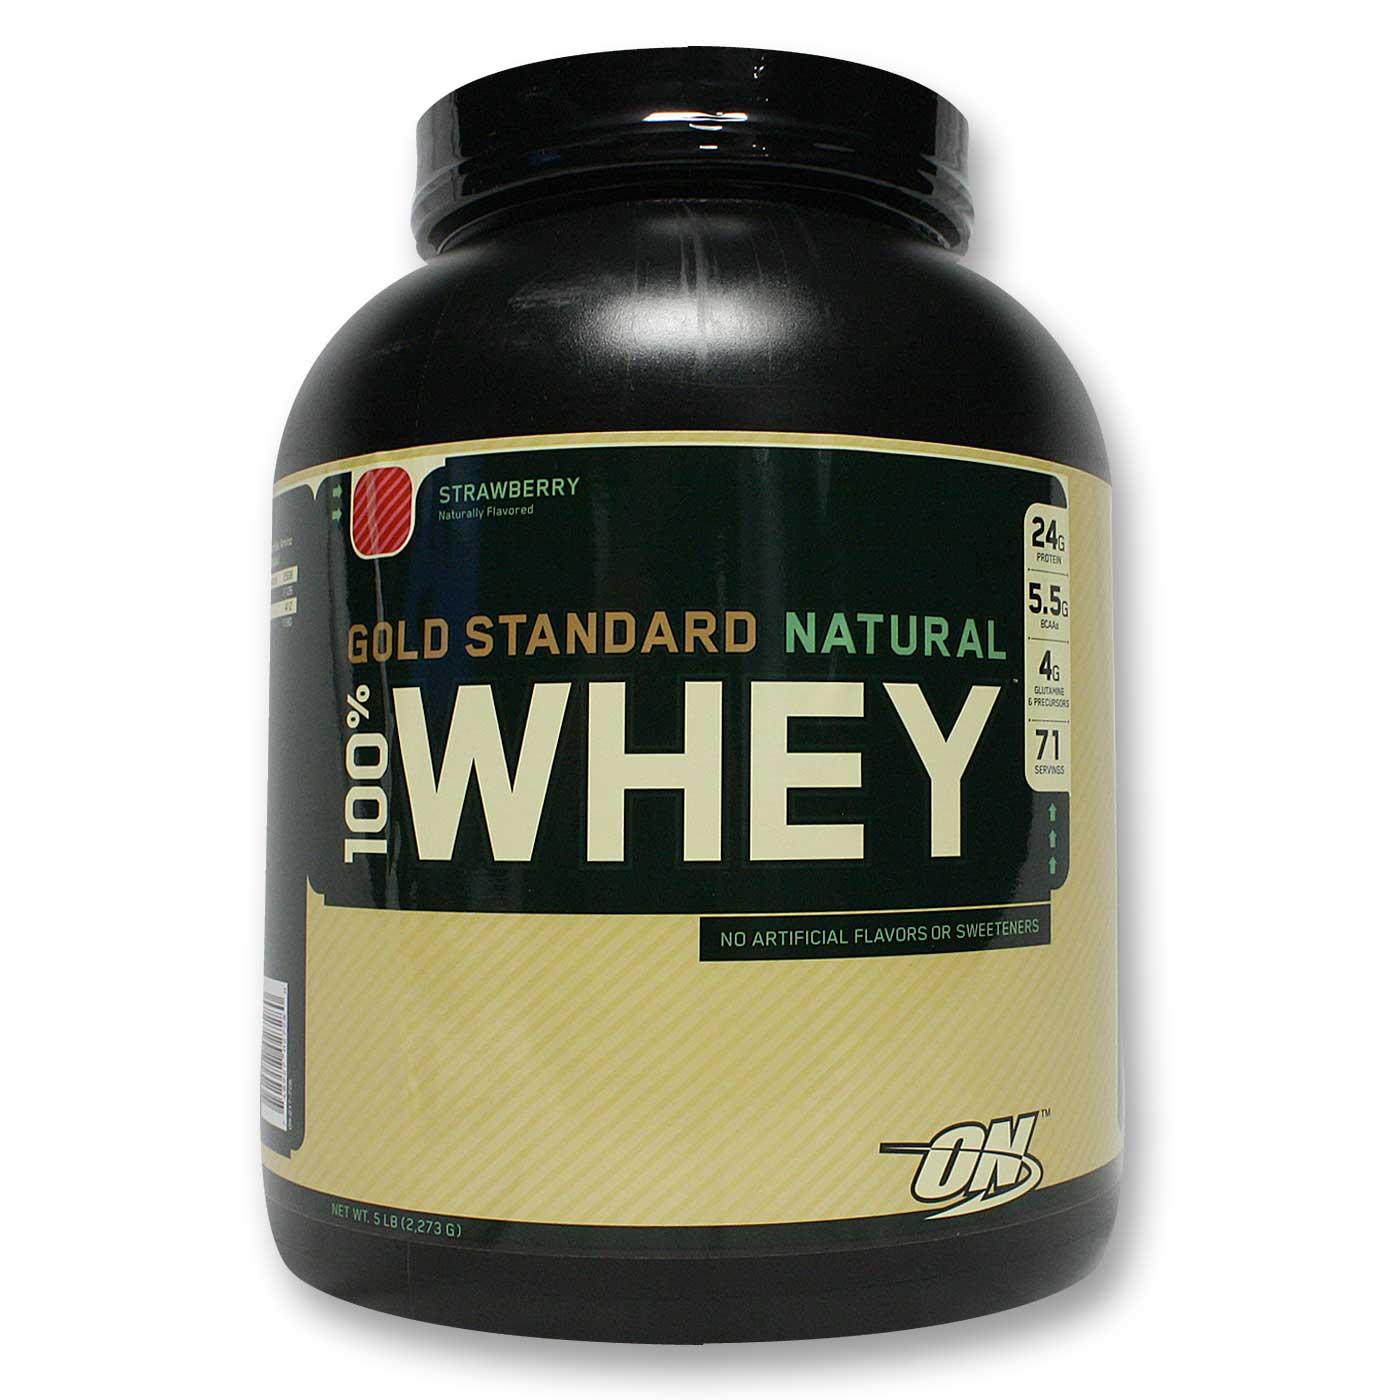 2dbba8ff3 100% Whey Proteína Gold Standard Natural Optimum Nutrition Strawberry 5 lbs   2.341 gr Comprar